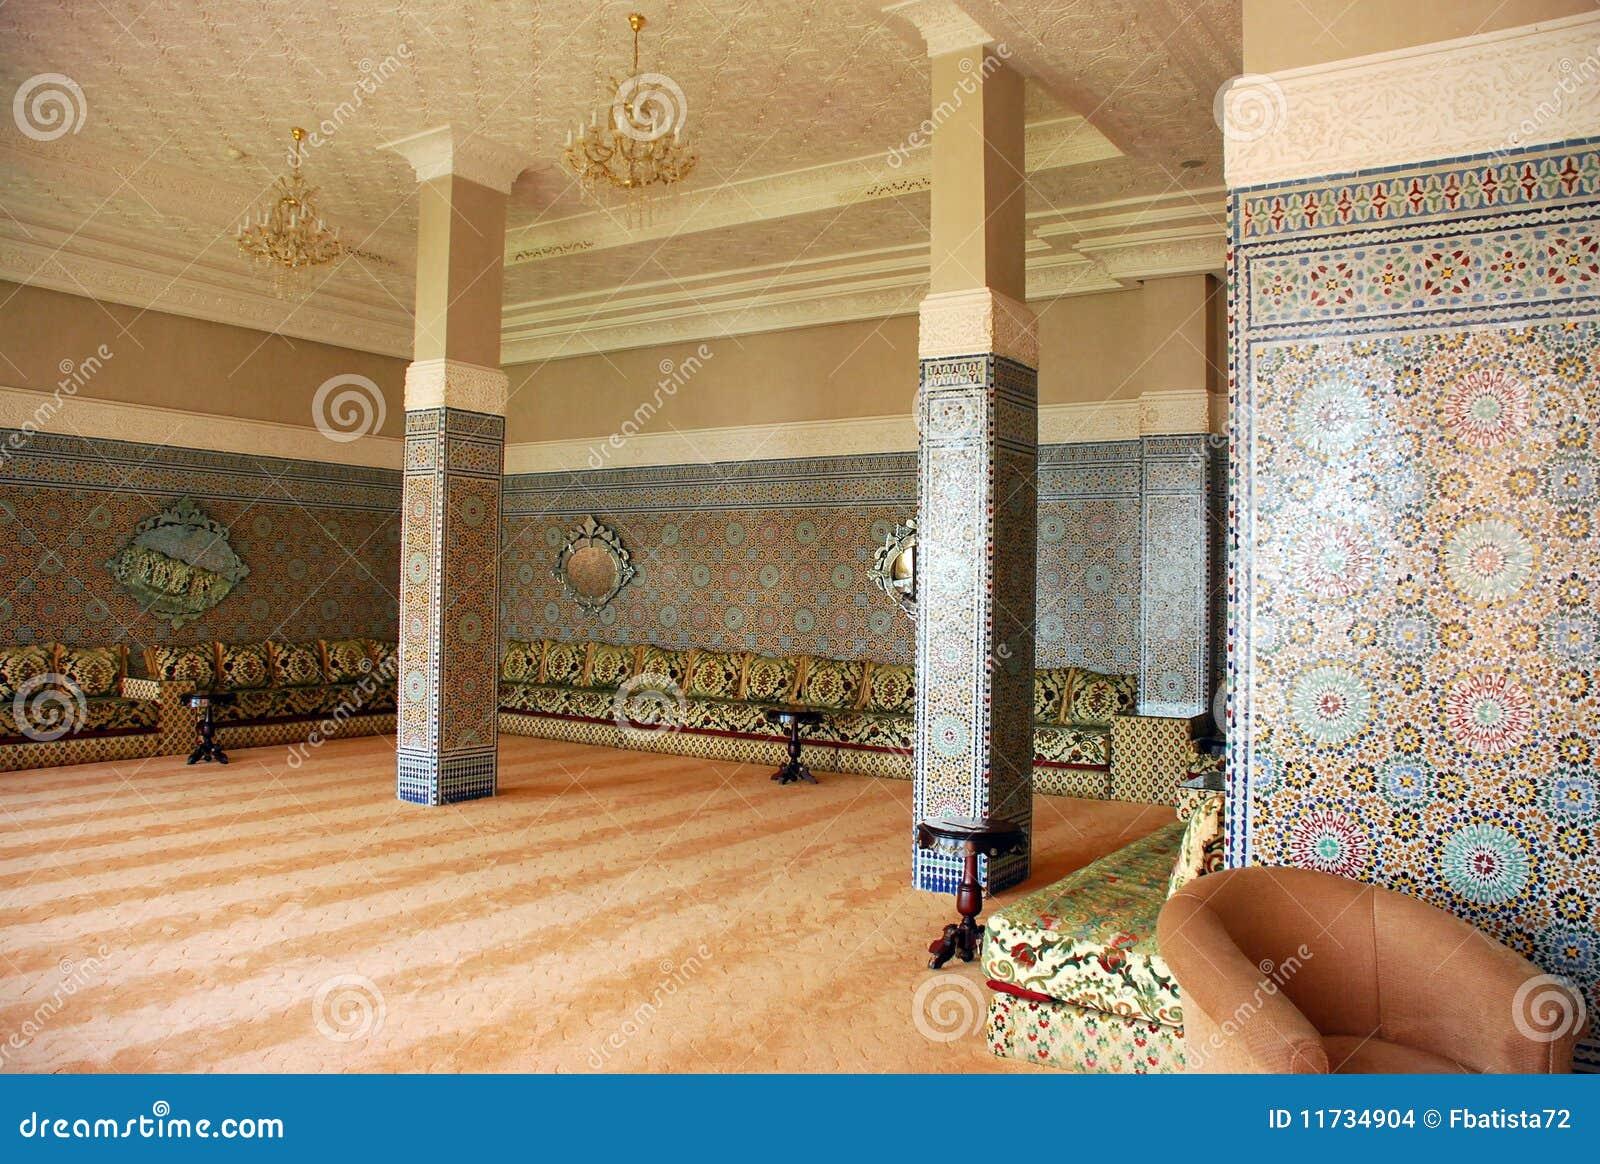 inneres traditionelles arabisches haus stockfoto bild